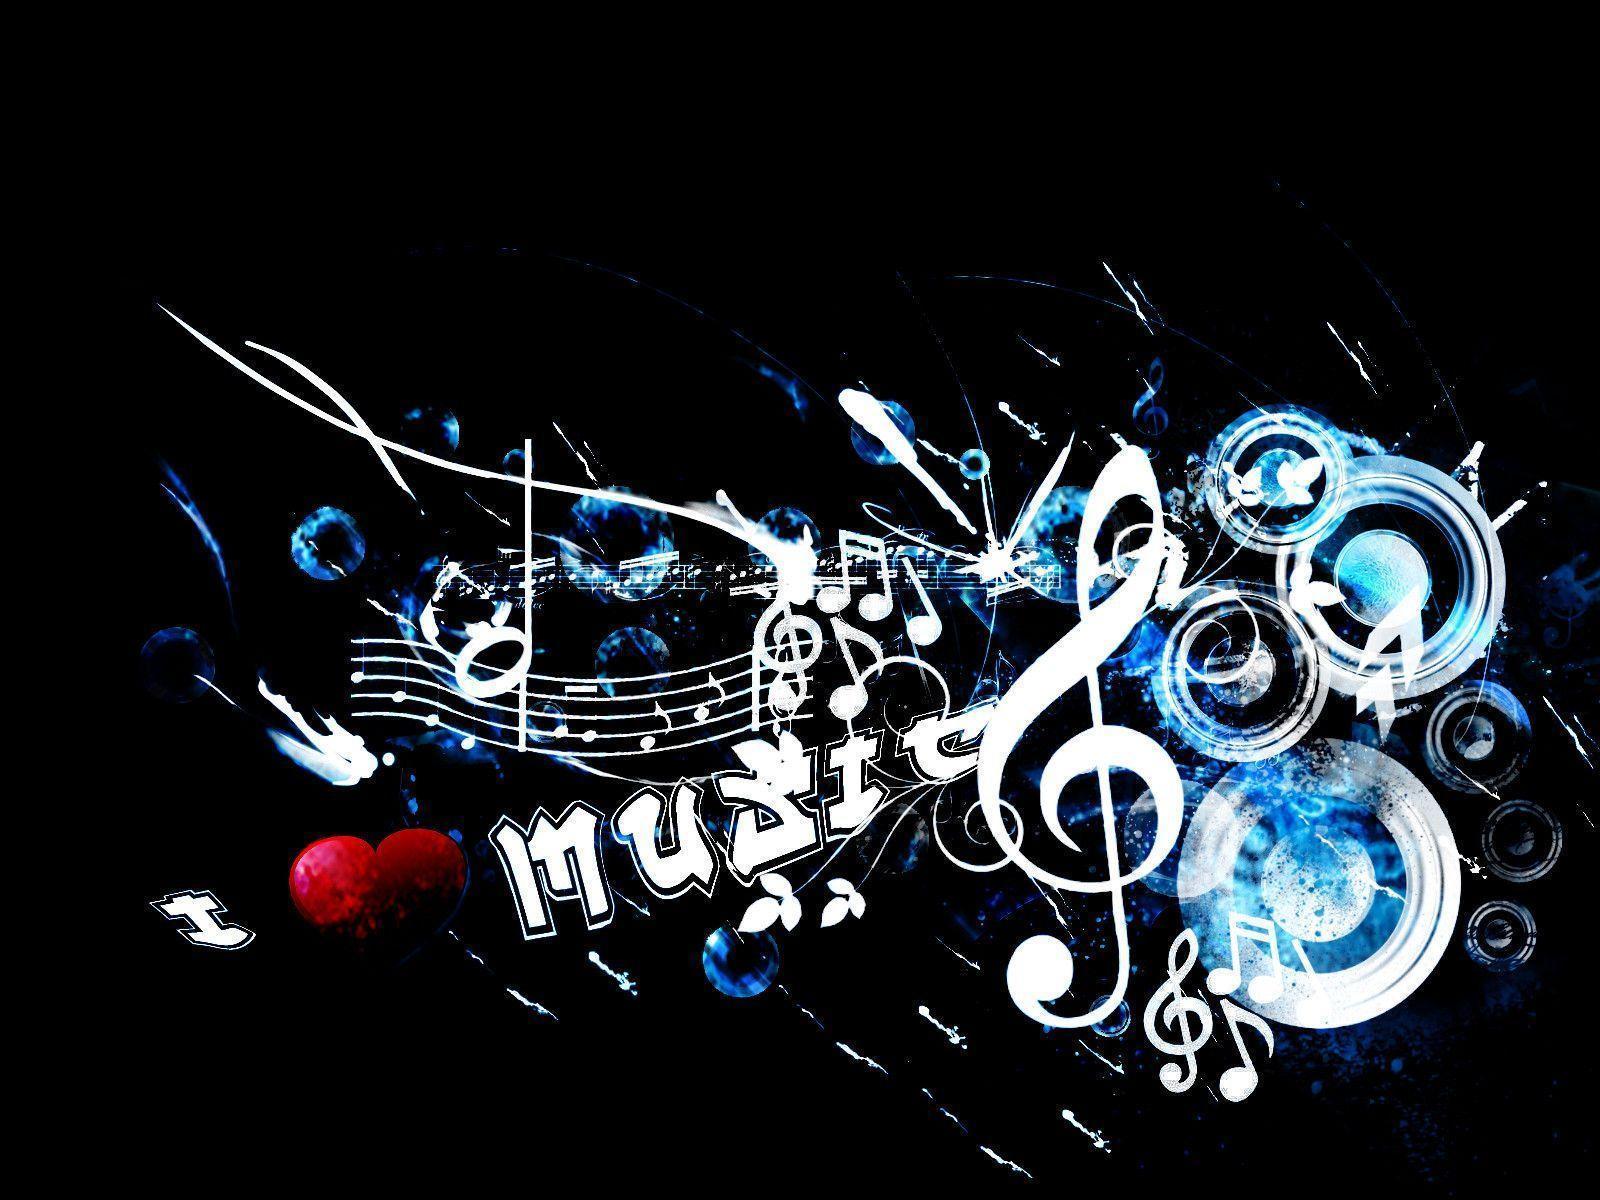 cool music wallpaper 37 - photo #9